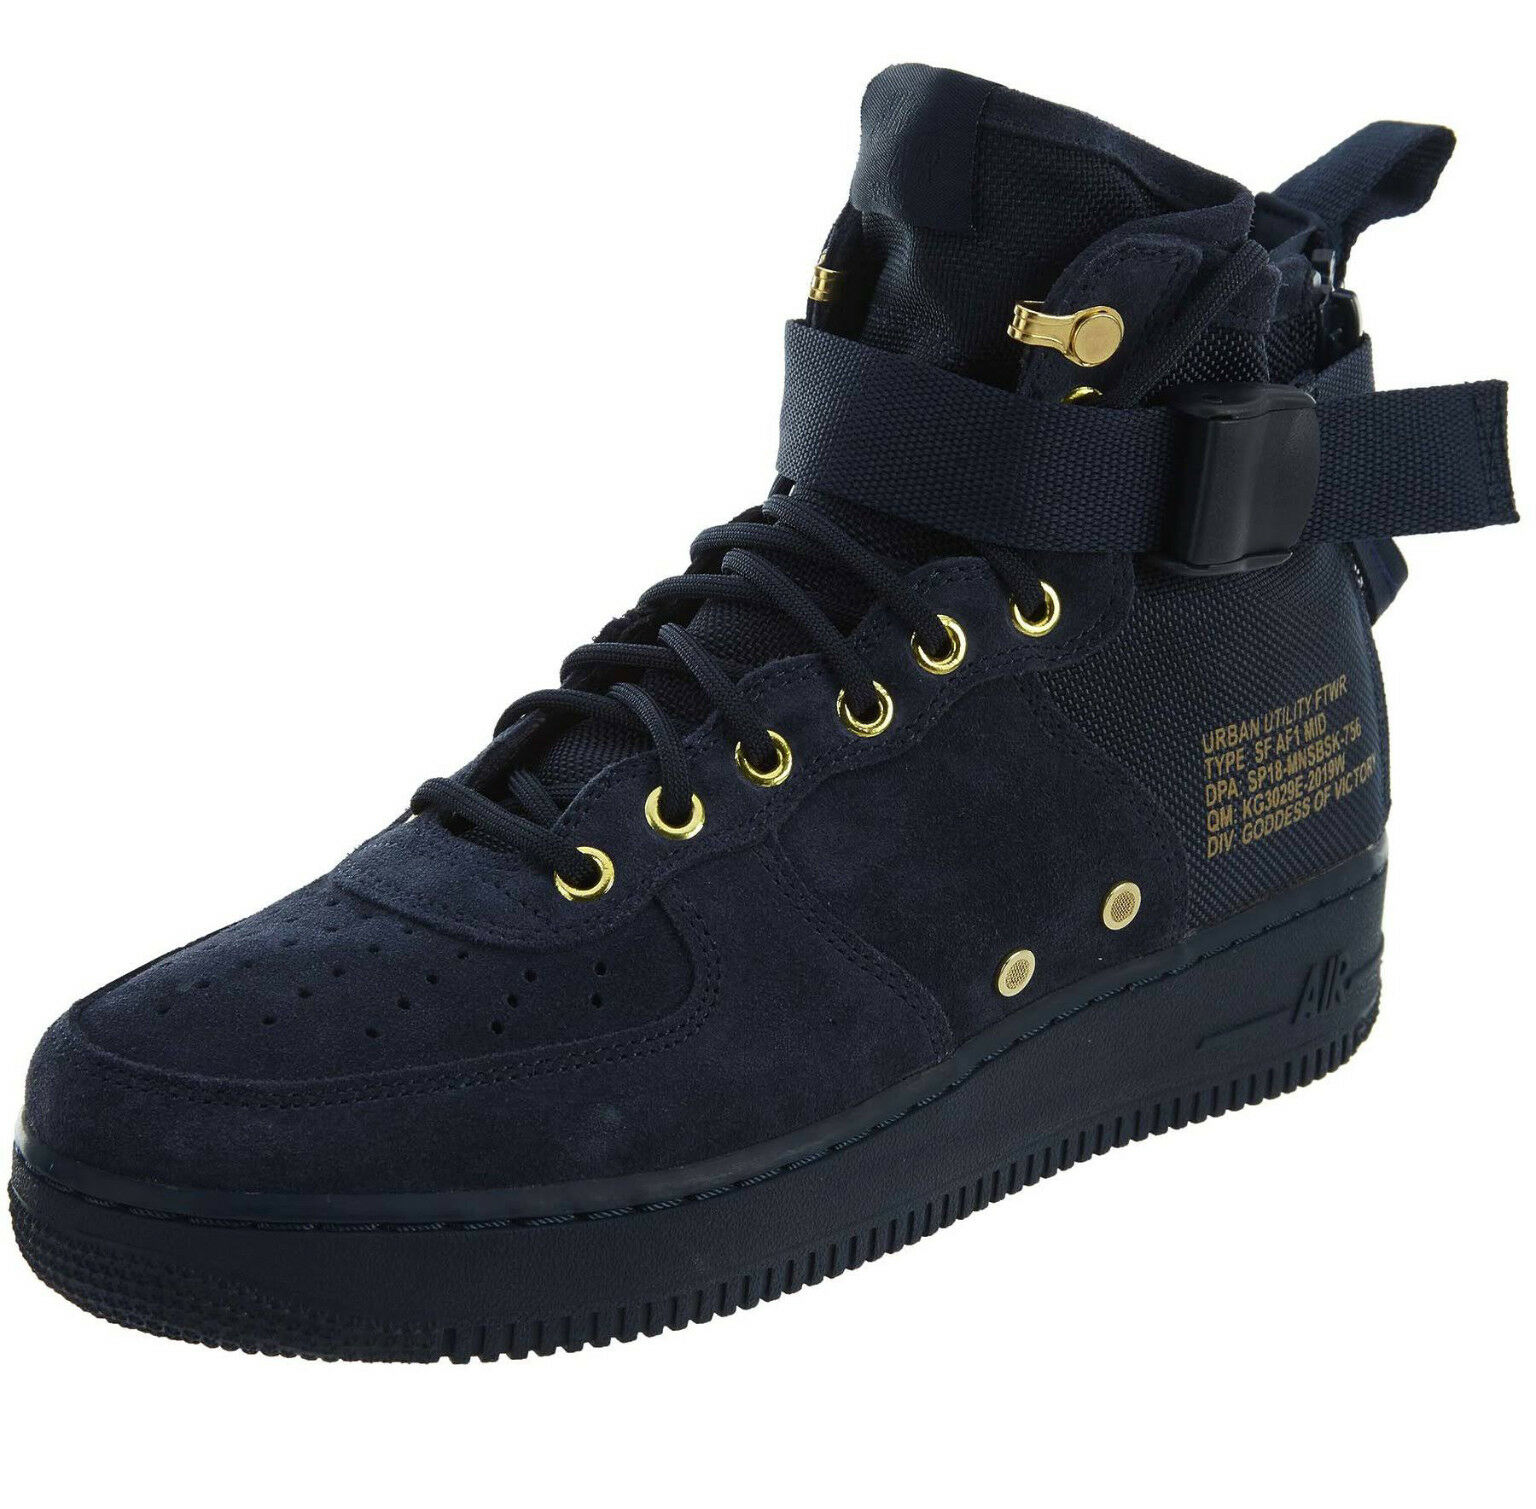 Nike SF Air Force 1 MID 917753-400 Obsidian Suede Black Men's Sportswear Shoes